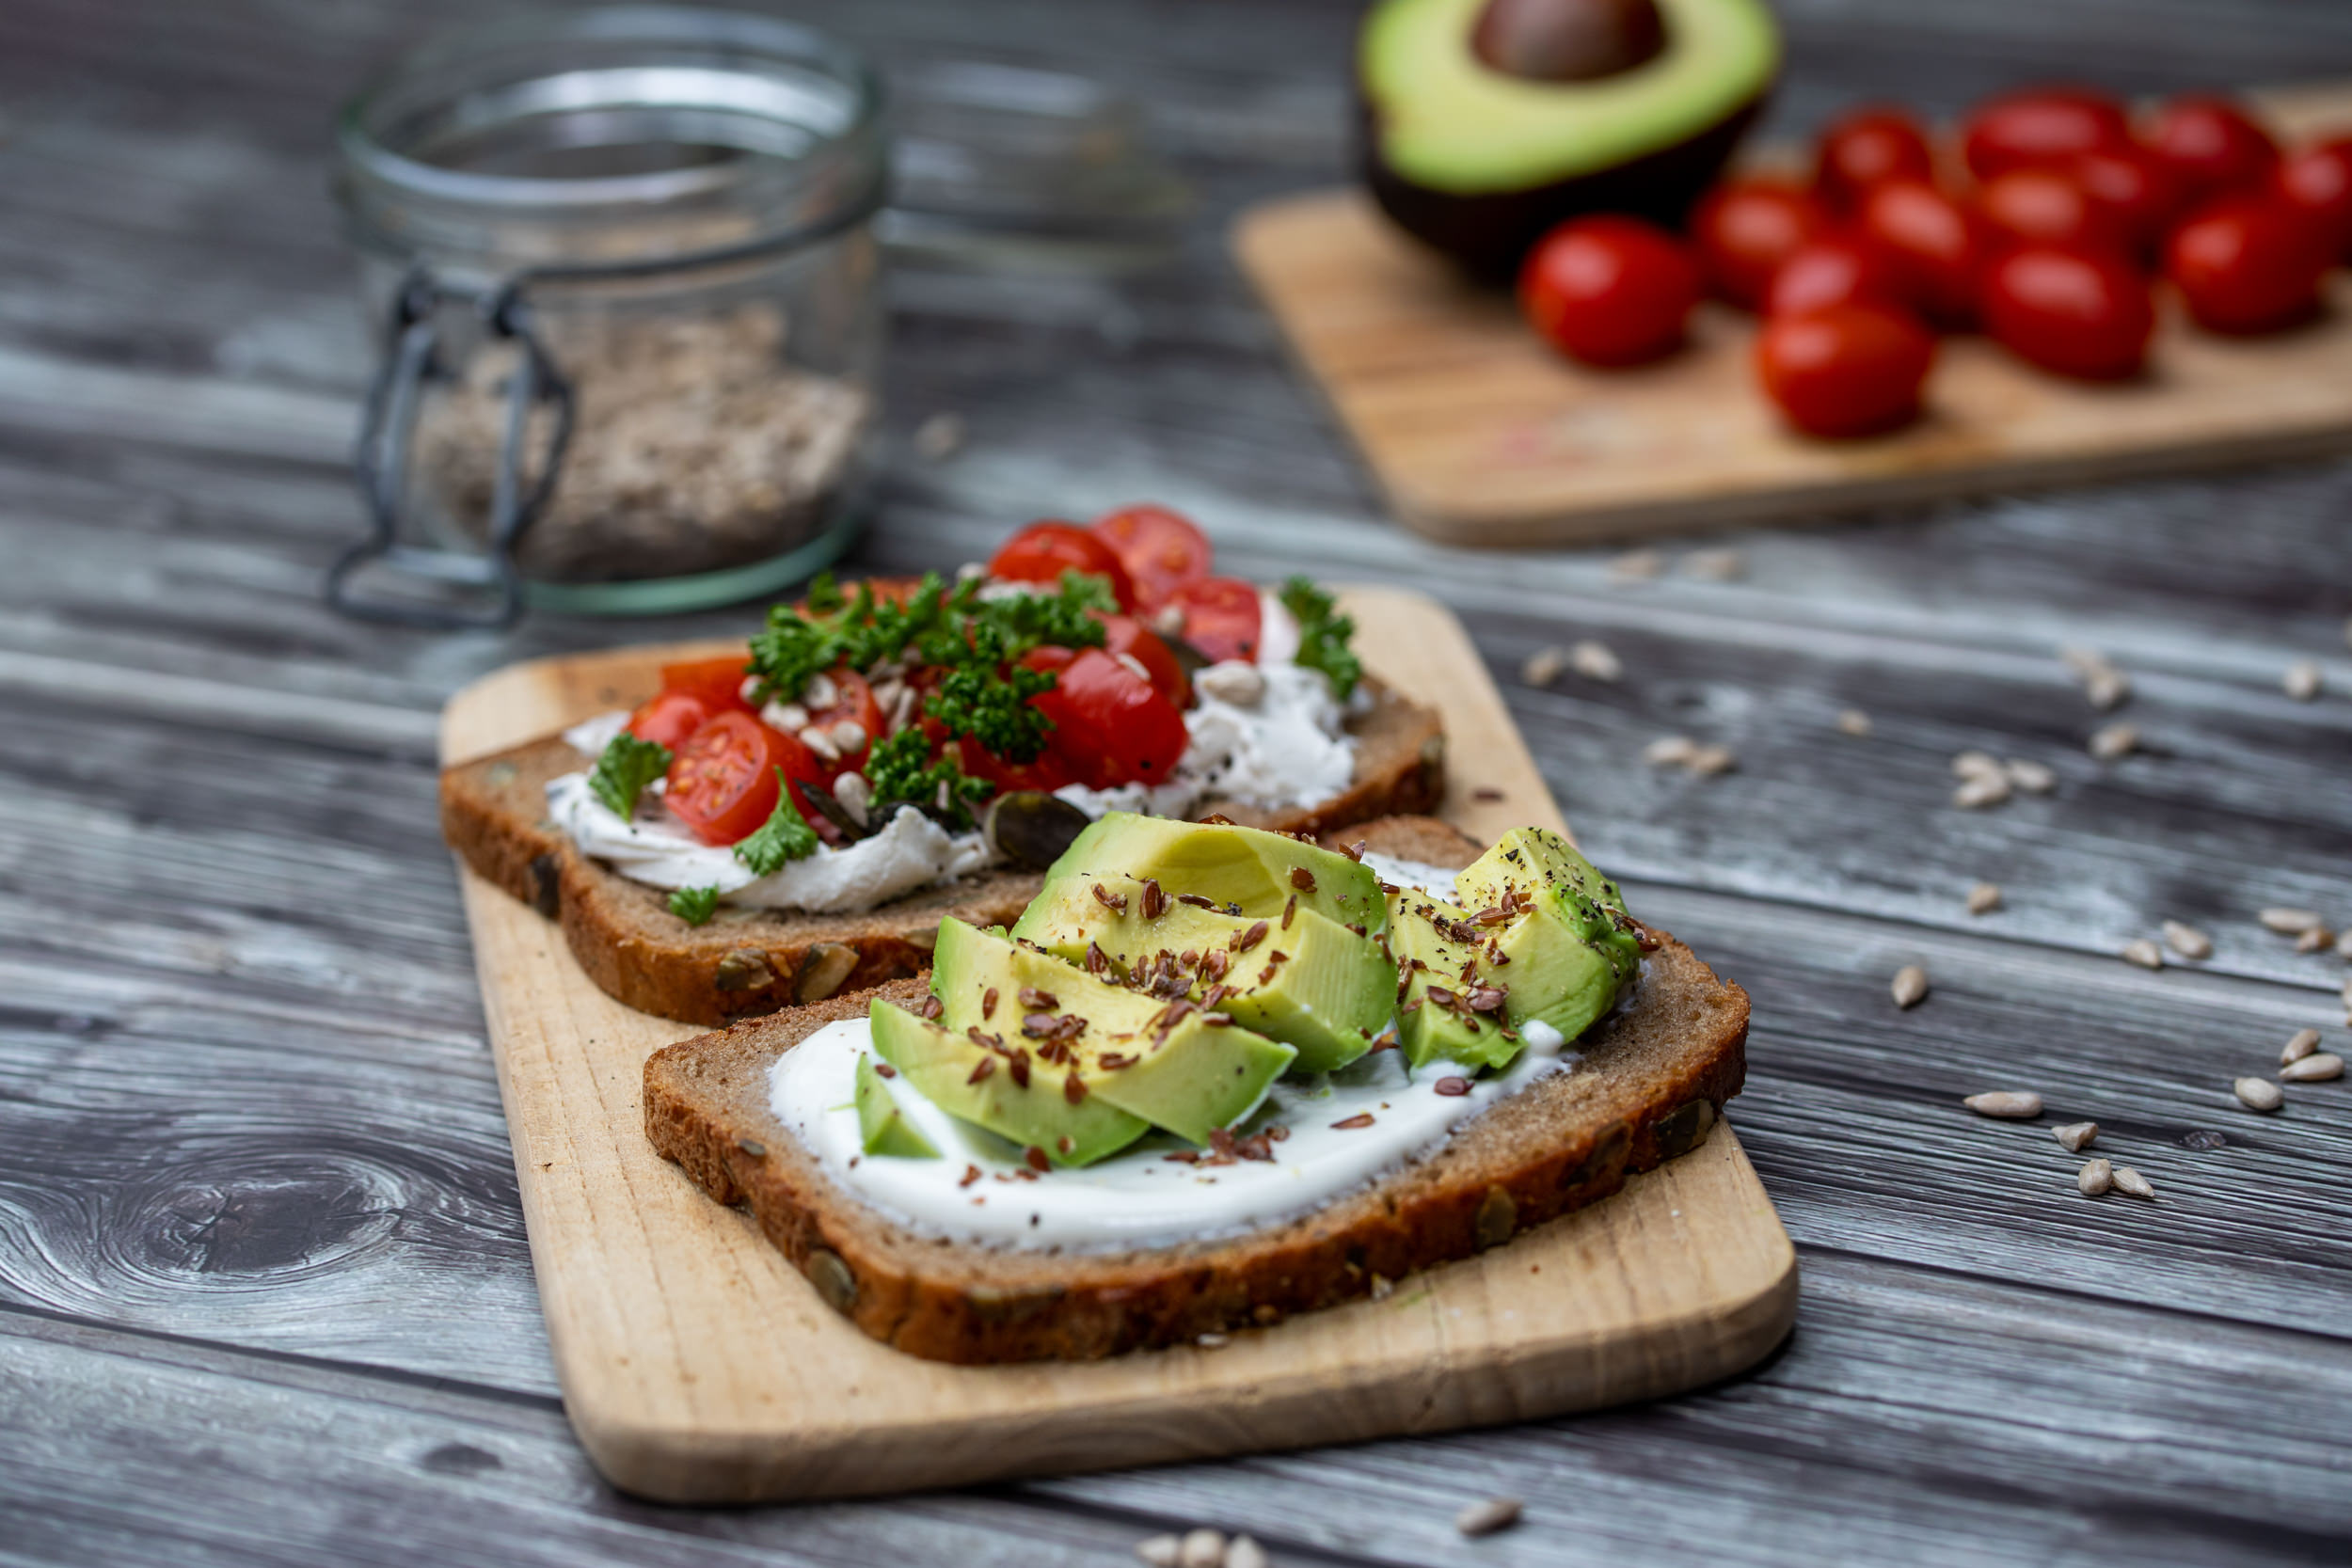 FOOD STUDIO PATRICKSCHMETZER ESSEN 6  Food